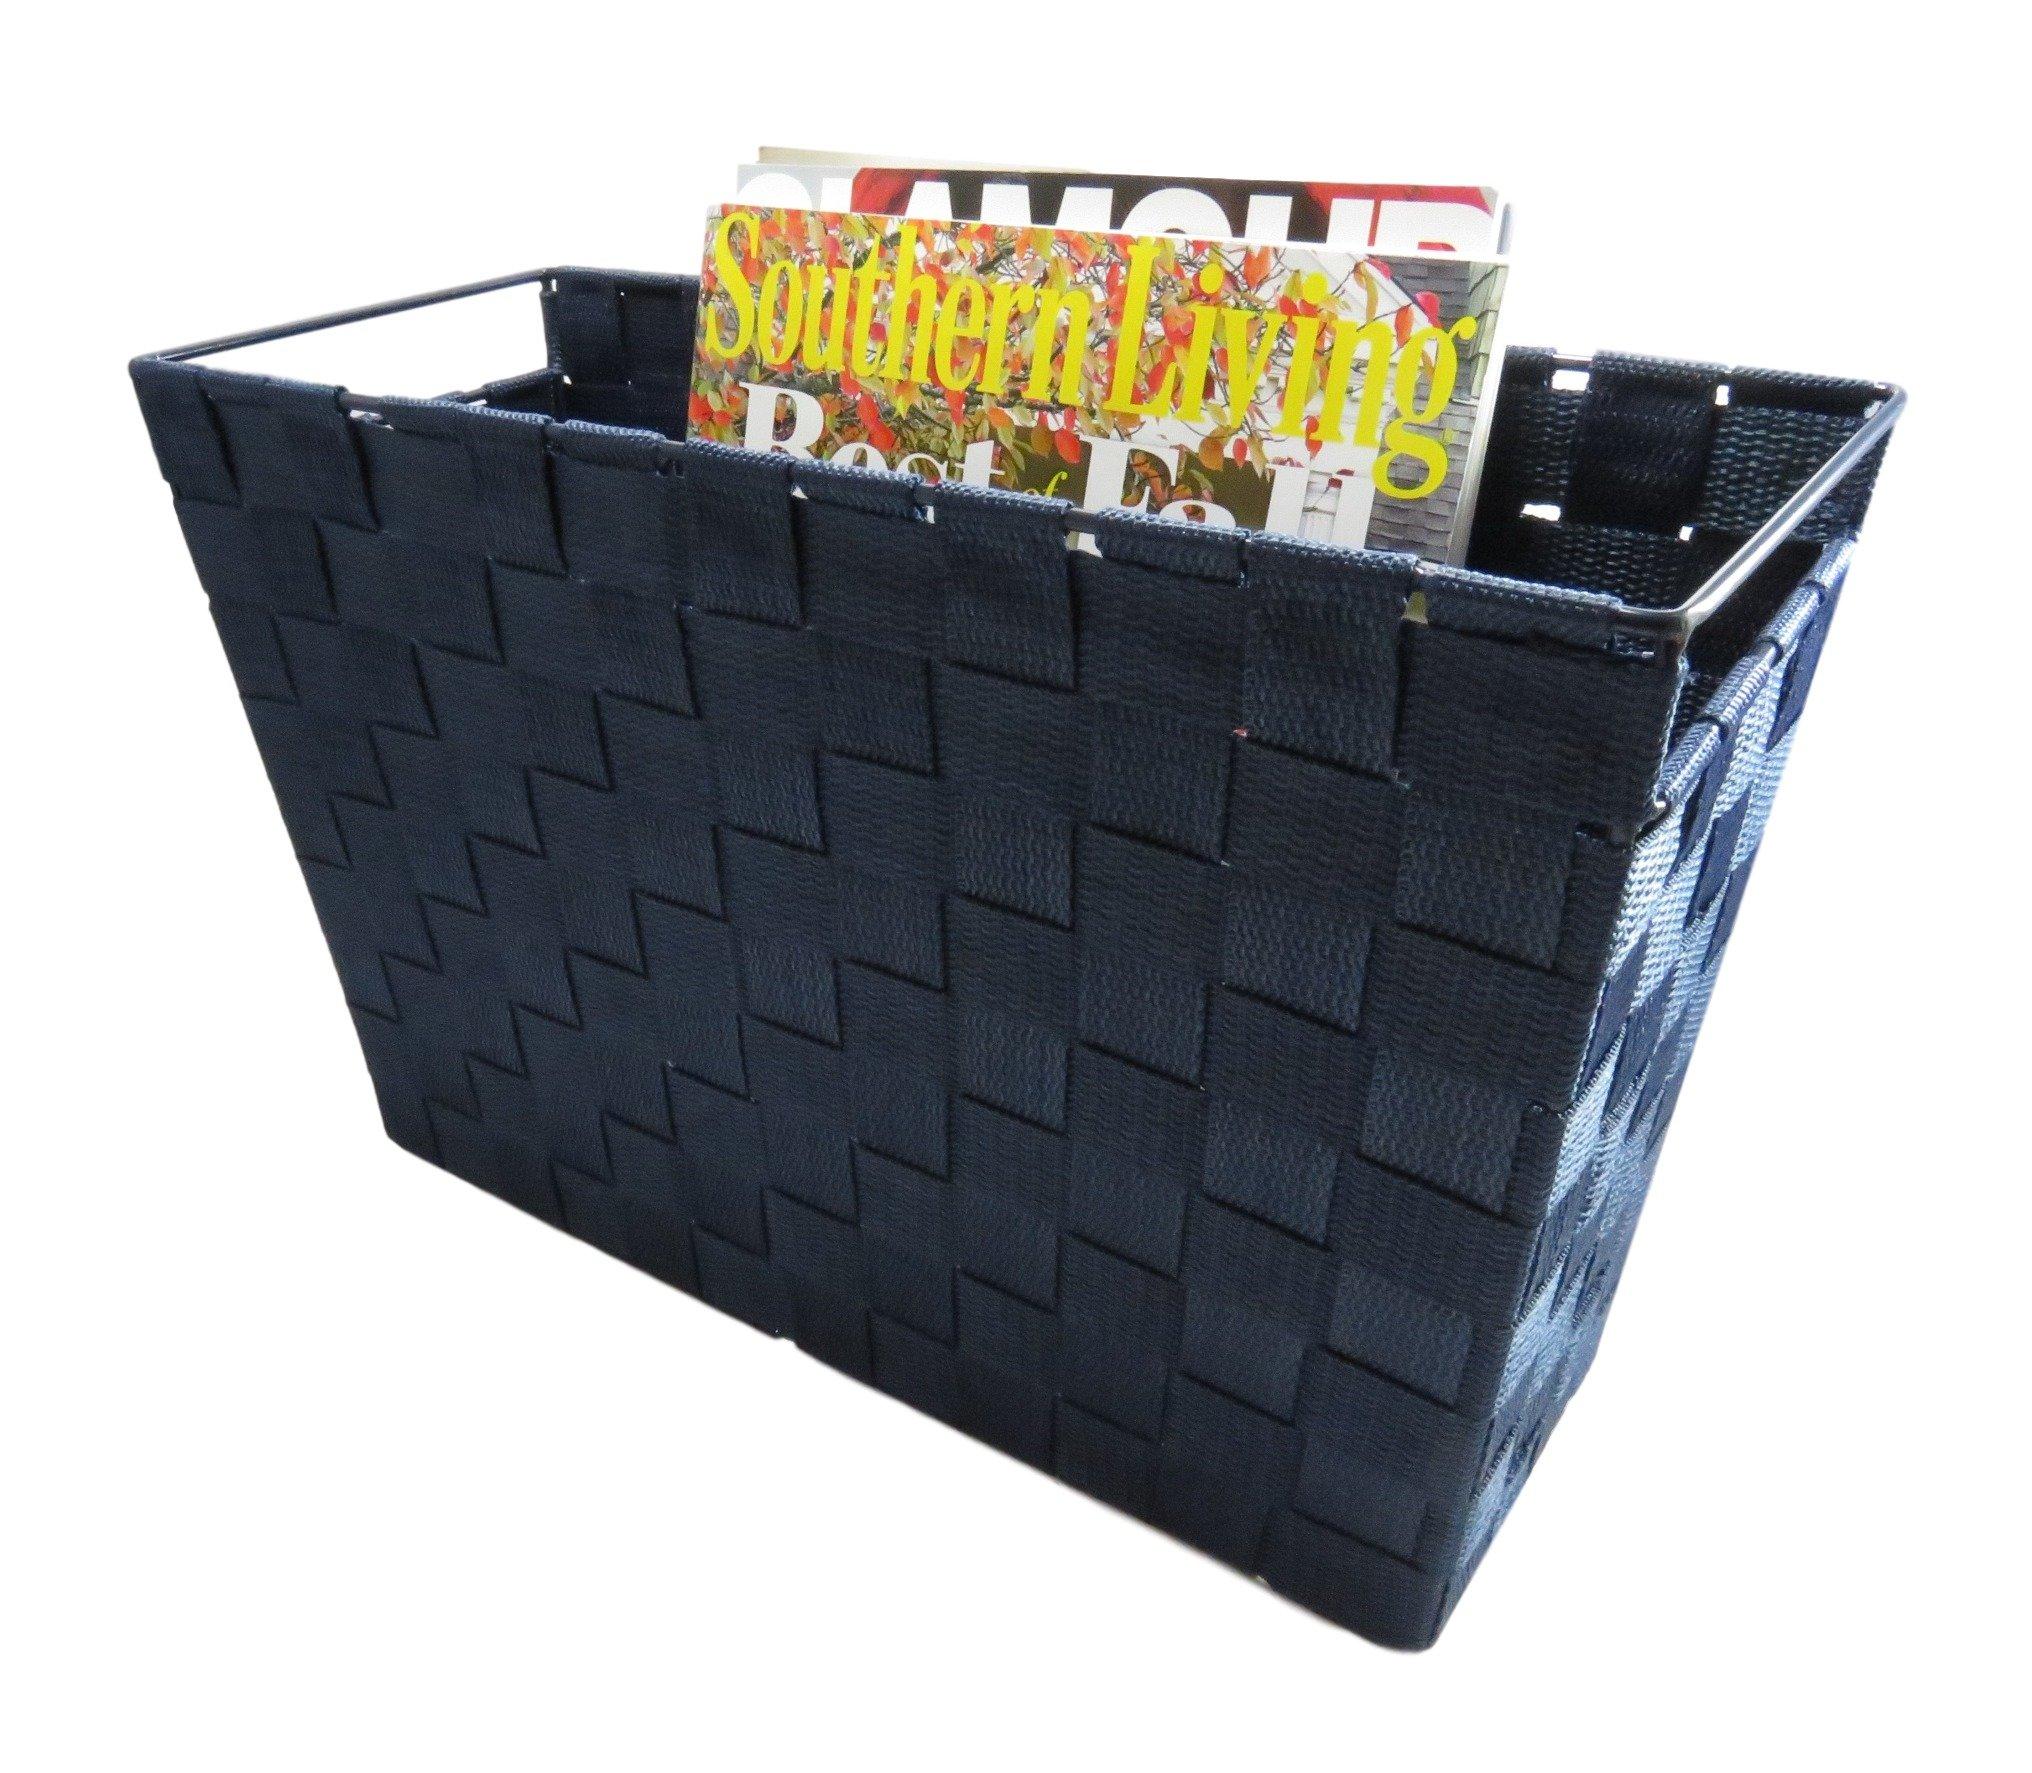 Magazine File Storage Organizer Basket Woven Strap Built-in Handles Shelf Tote 14 1/2 x 9 7/16 Navy Blue